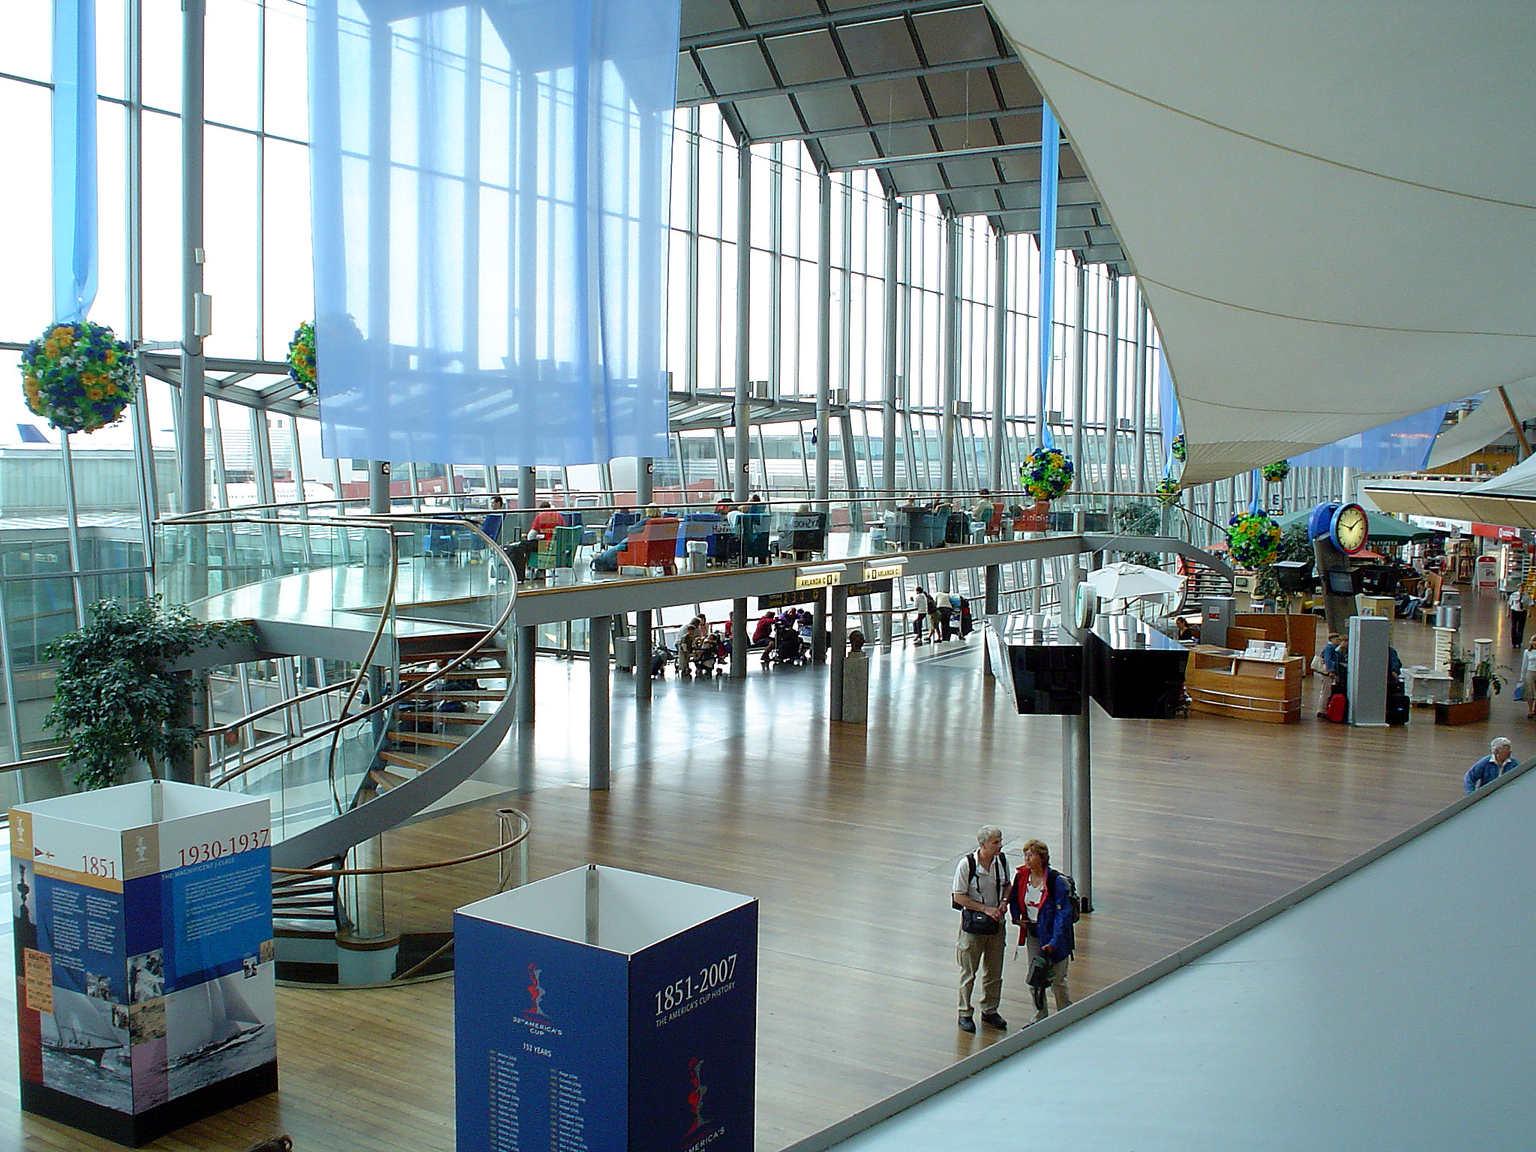 аэропорт Стокгольм Бромма